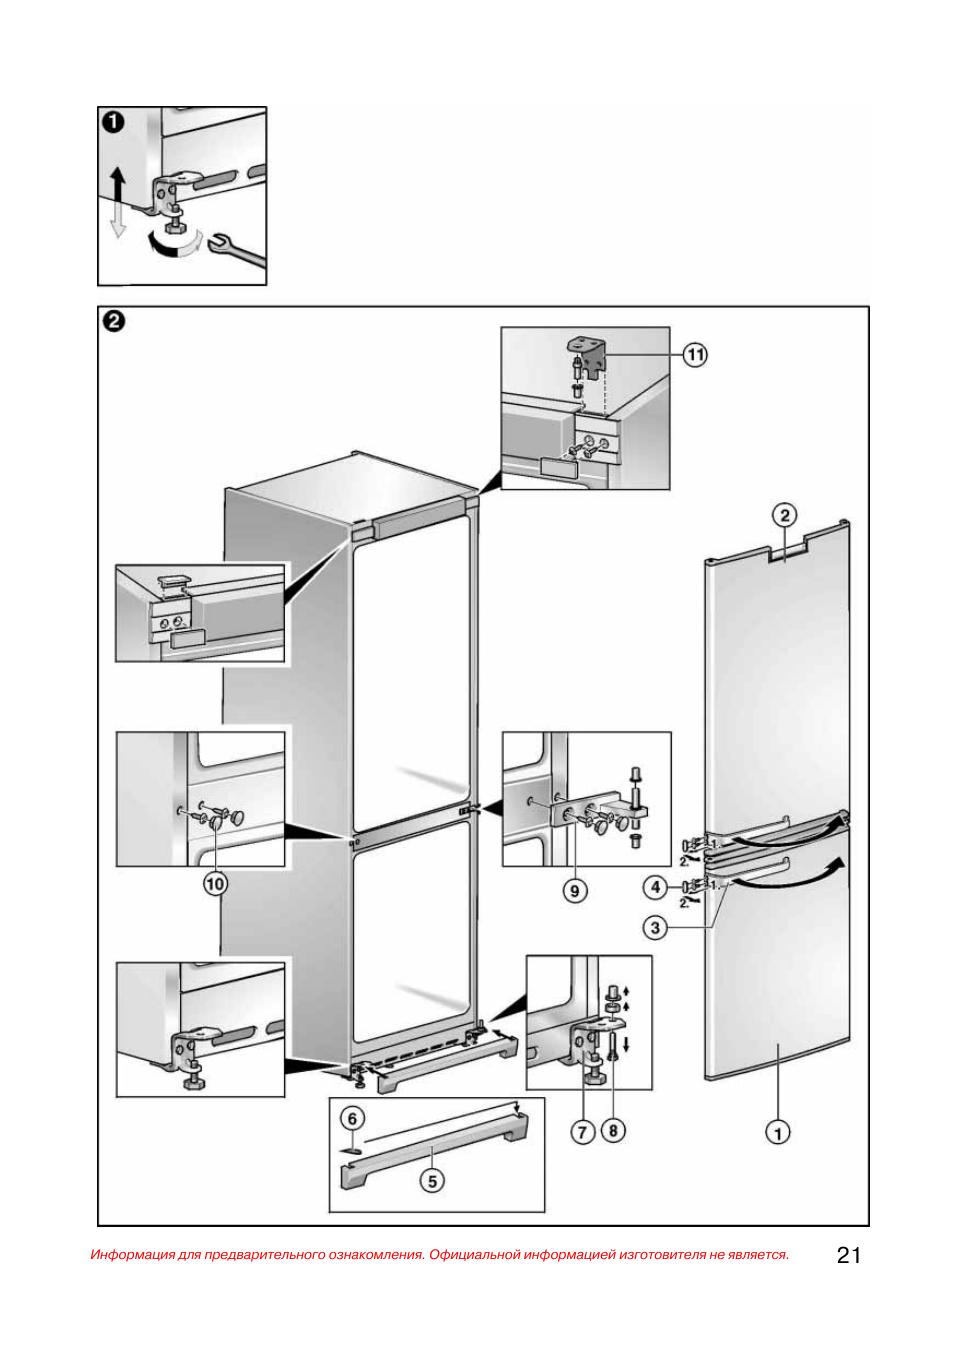 Инструкция по эксплуатации Bosch KGS 39X48 Страница 22 / 23 Также для: KGS 36X48, KGS 36X25, KGS 33X25